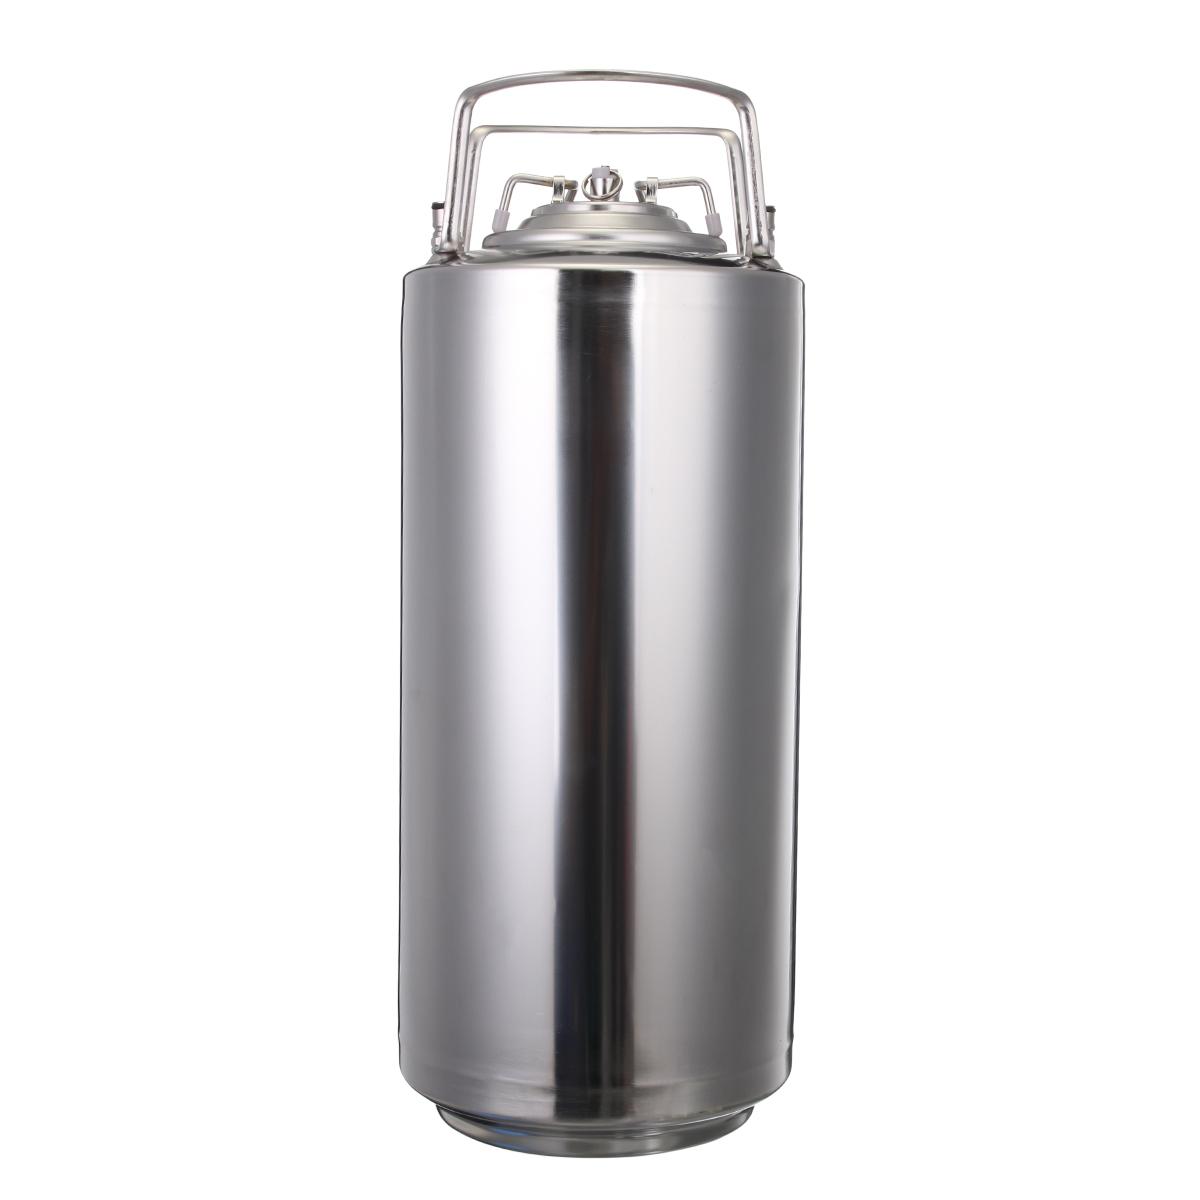 18.5L 304 Stainless Steel Home Brew Keg Bottles Growler Fresh Beer Making Barrels